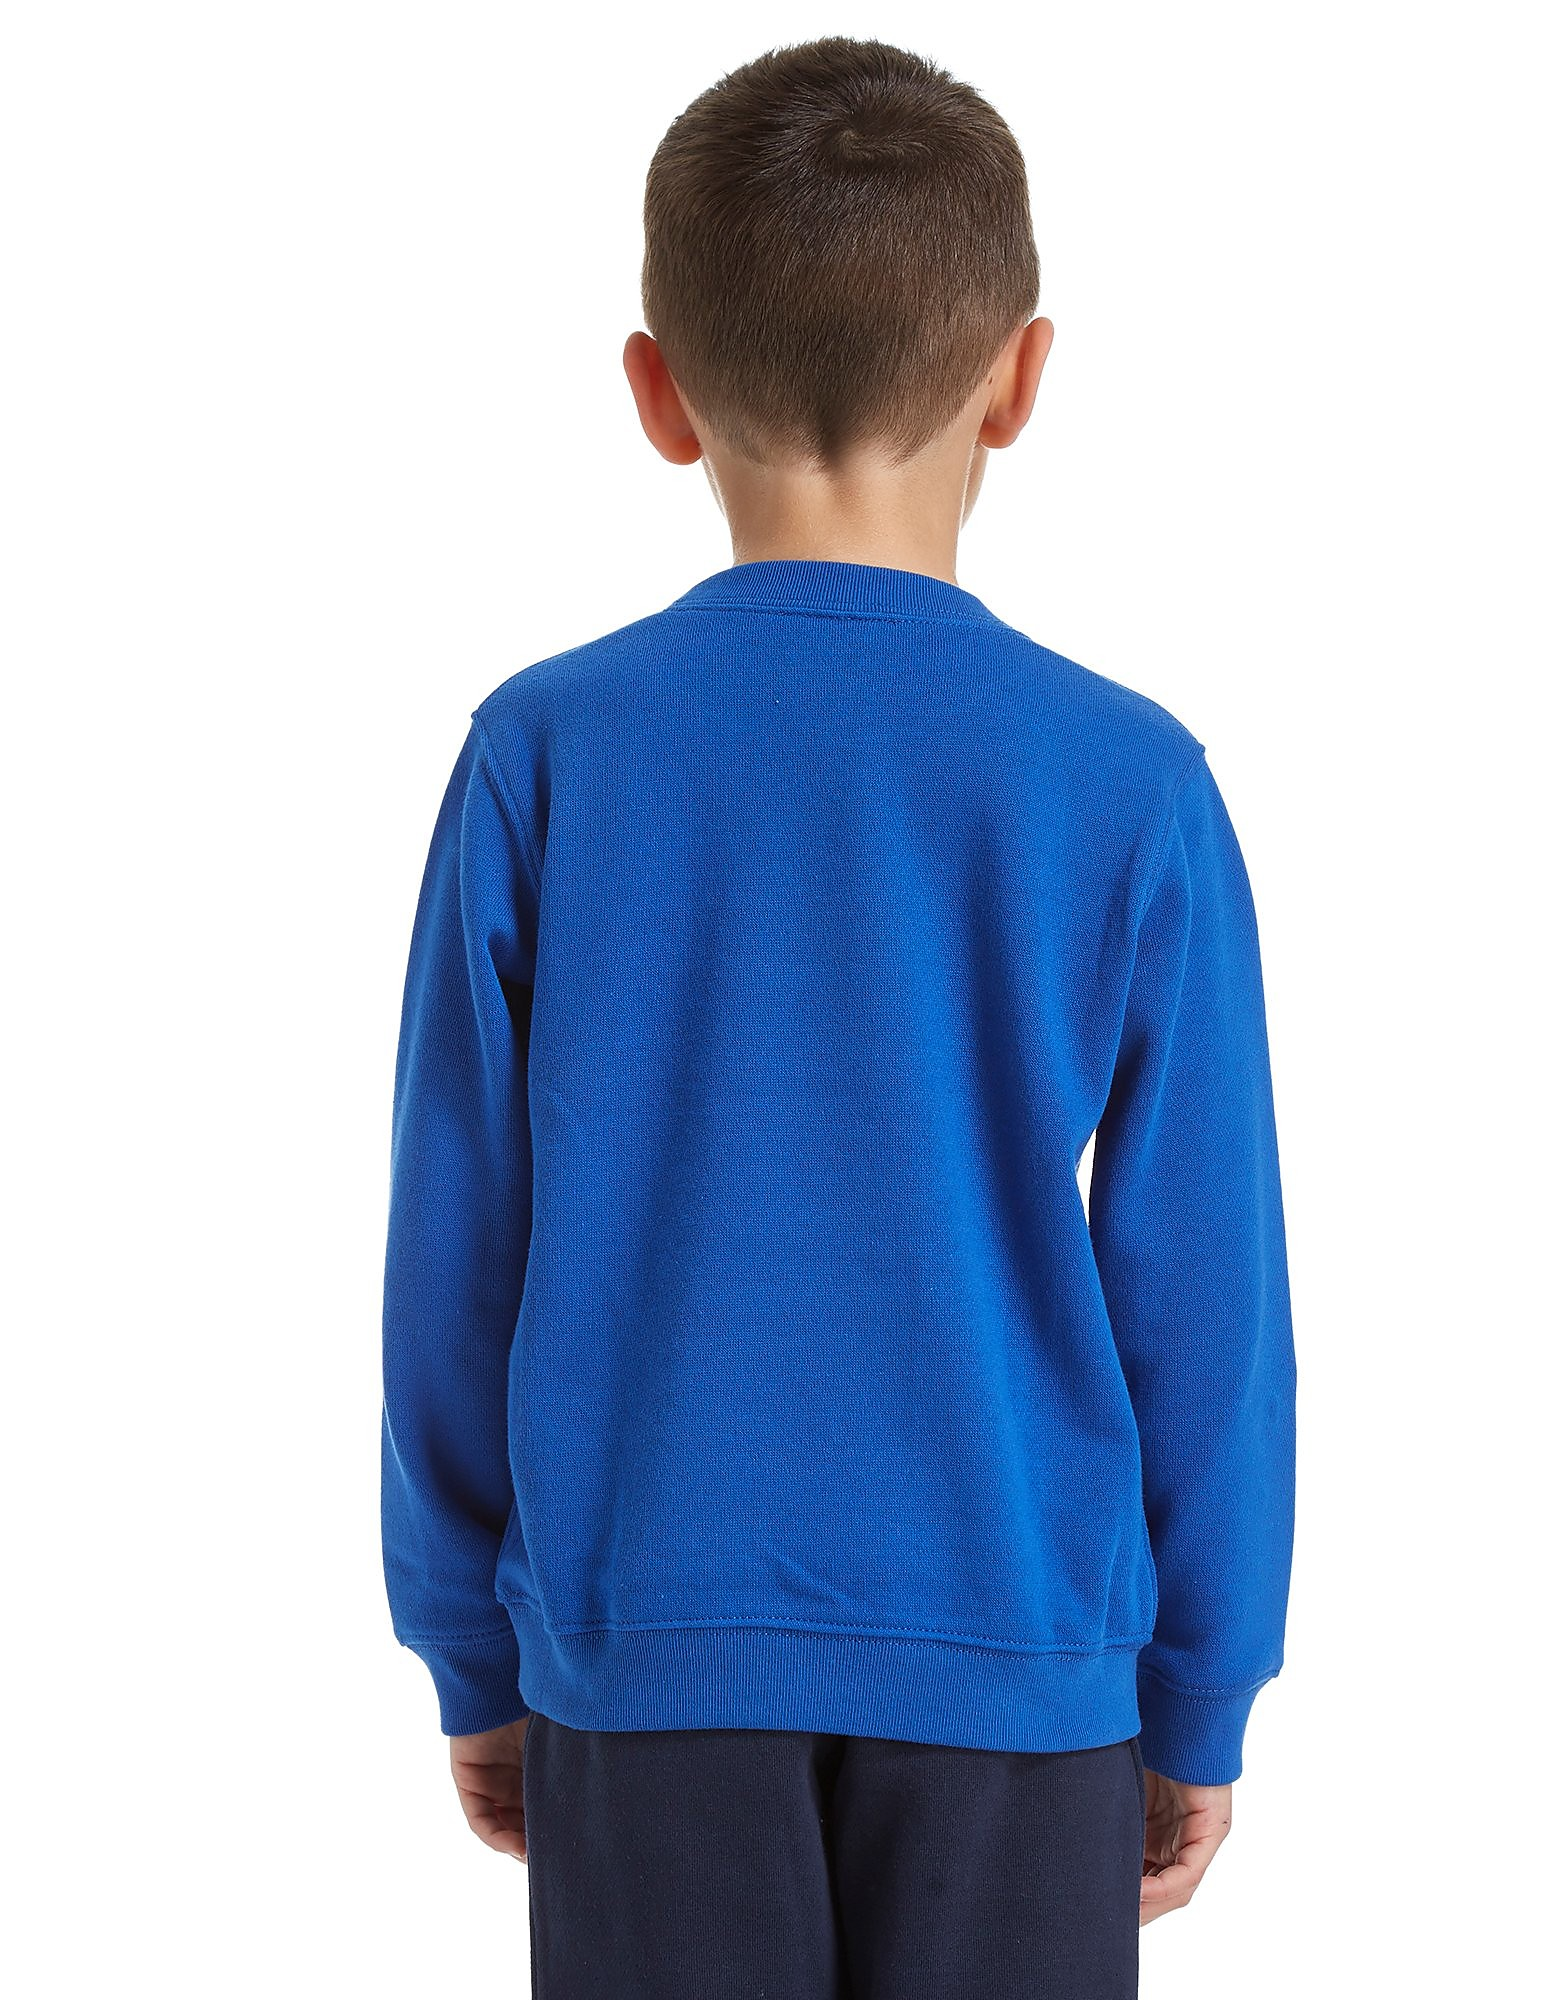 Nike Crew Neck Sweatshirt Children